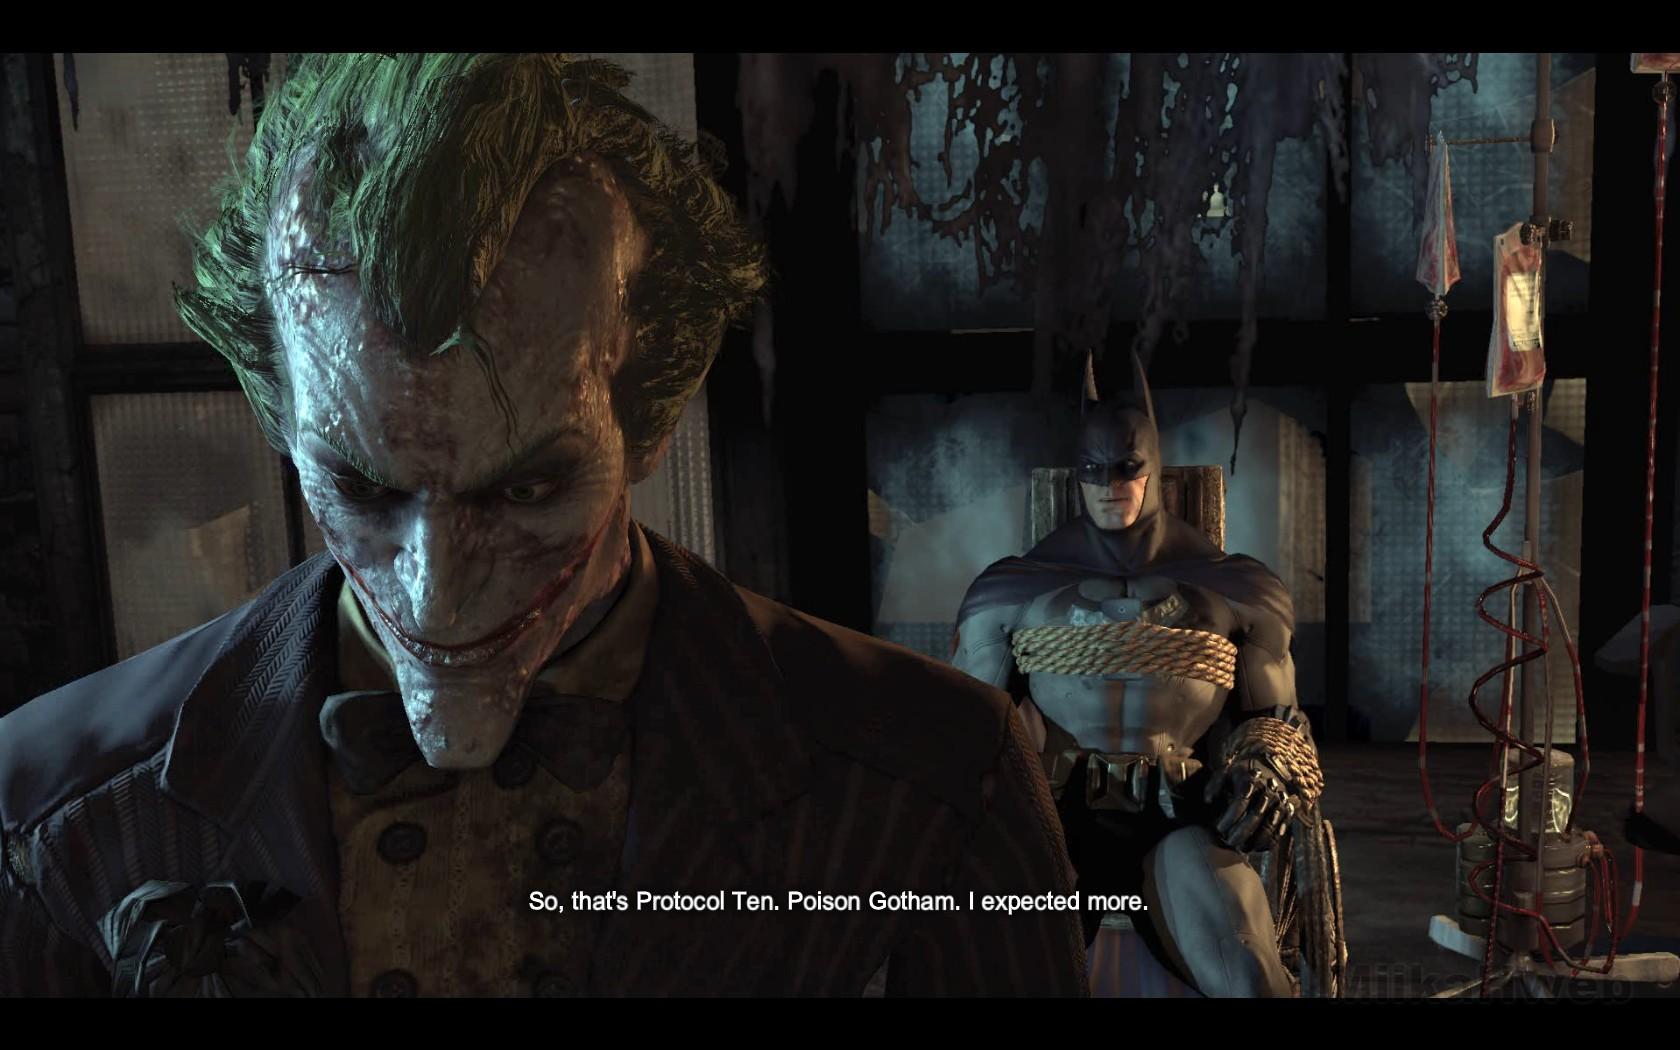 MiikaHweb - Game : Batman: Arkham City